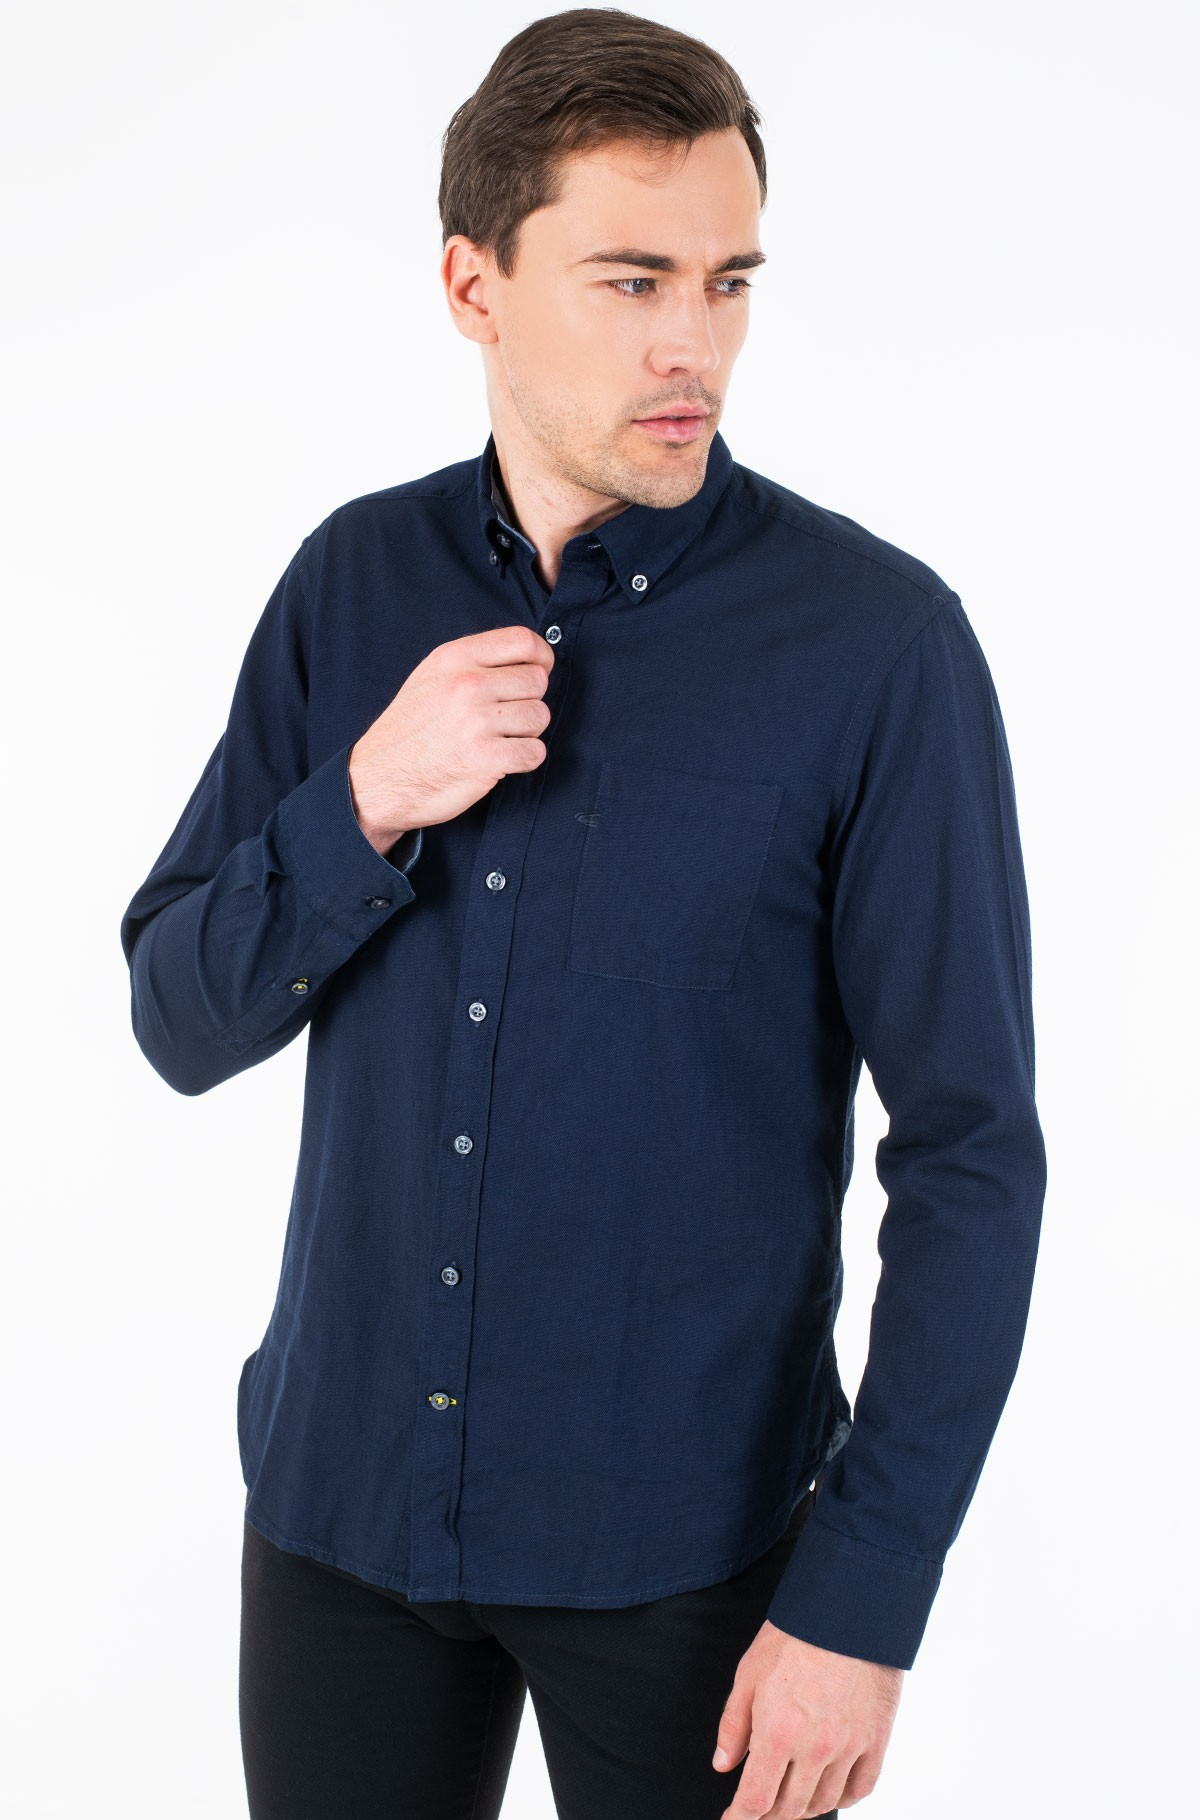 Marškiniai 409101/4S01-full-1